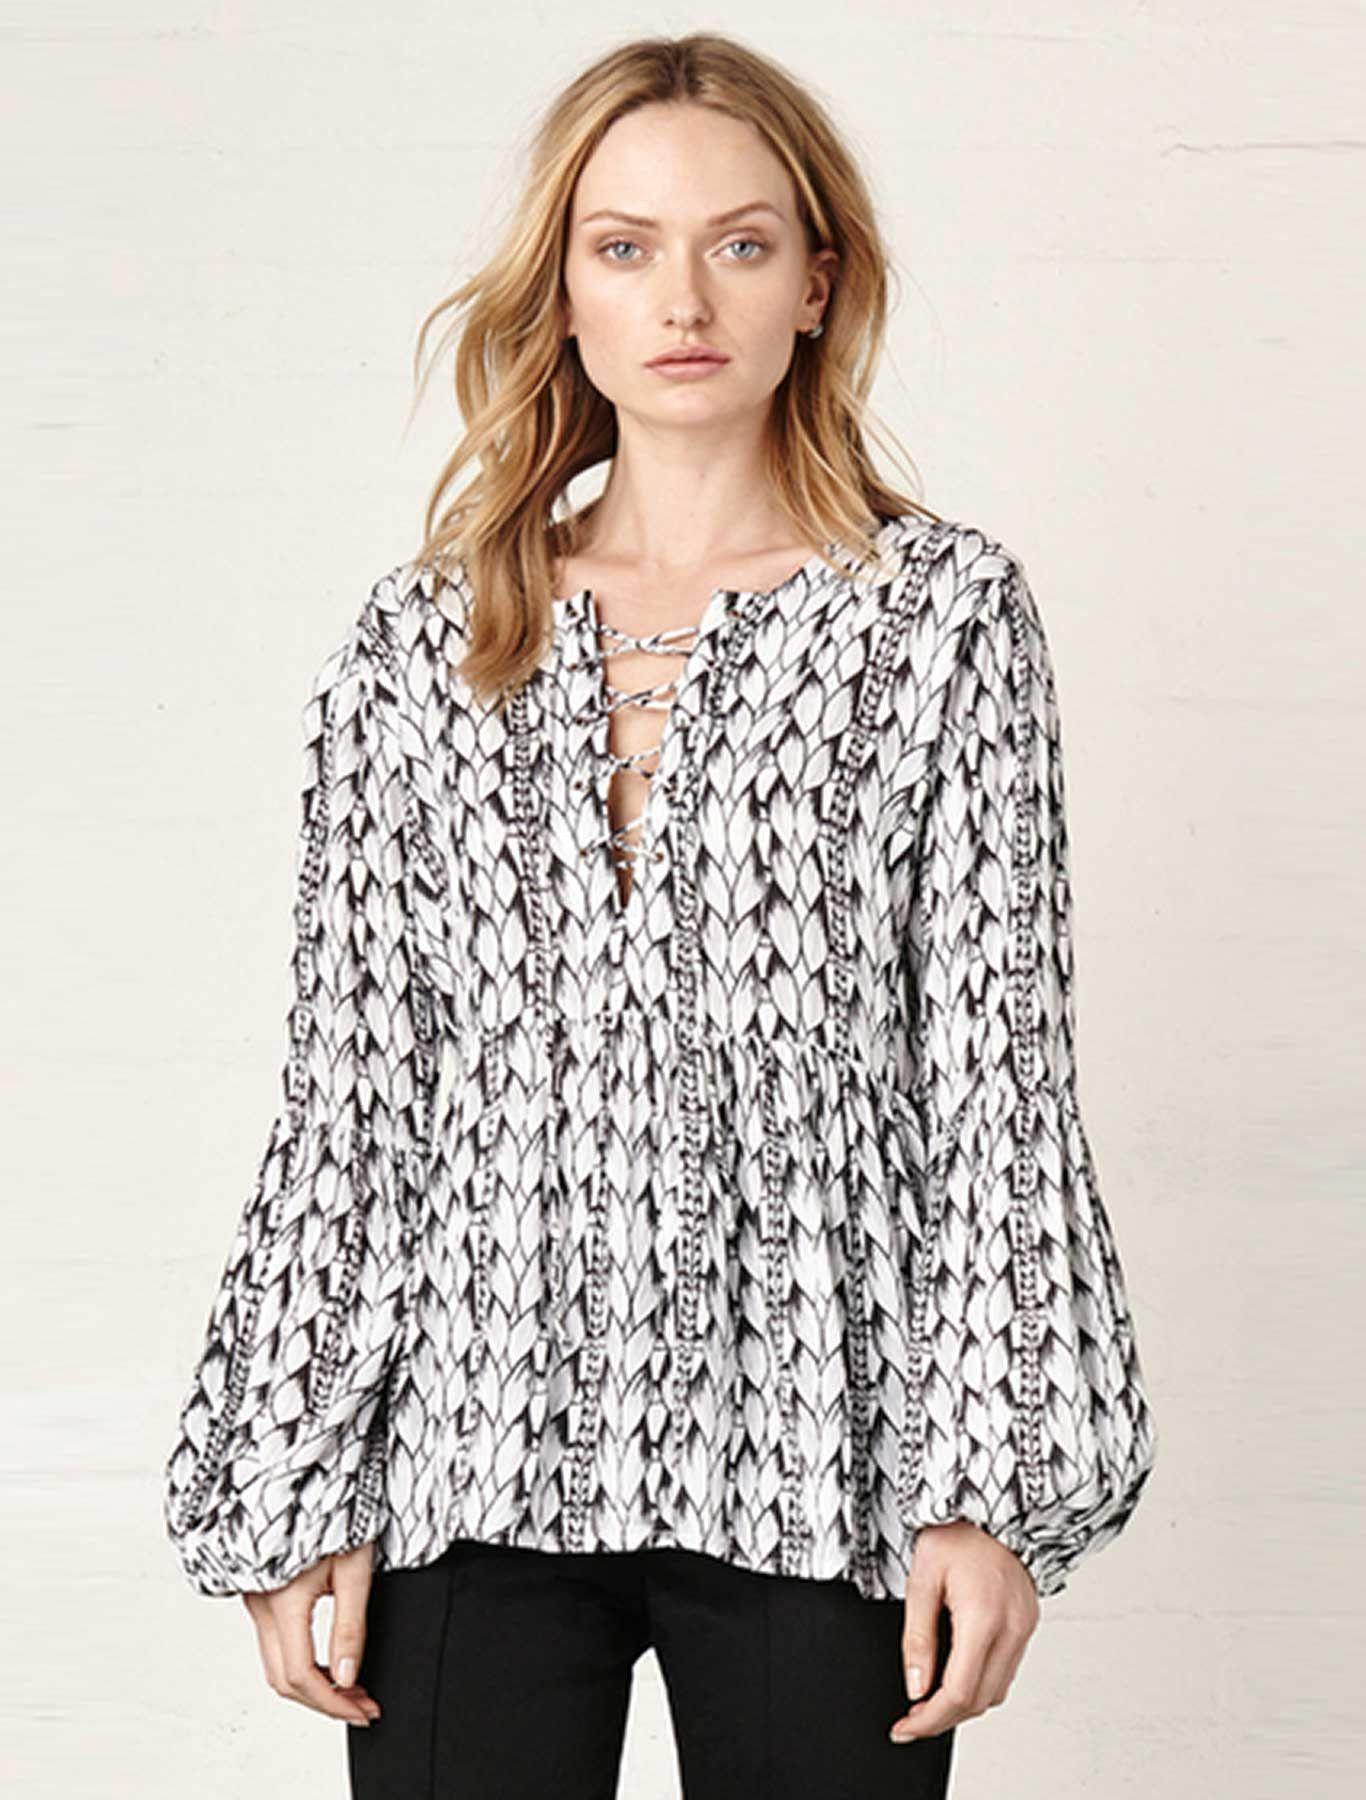 Steele - Zenith Shirt - Capella